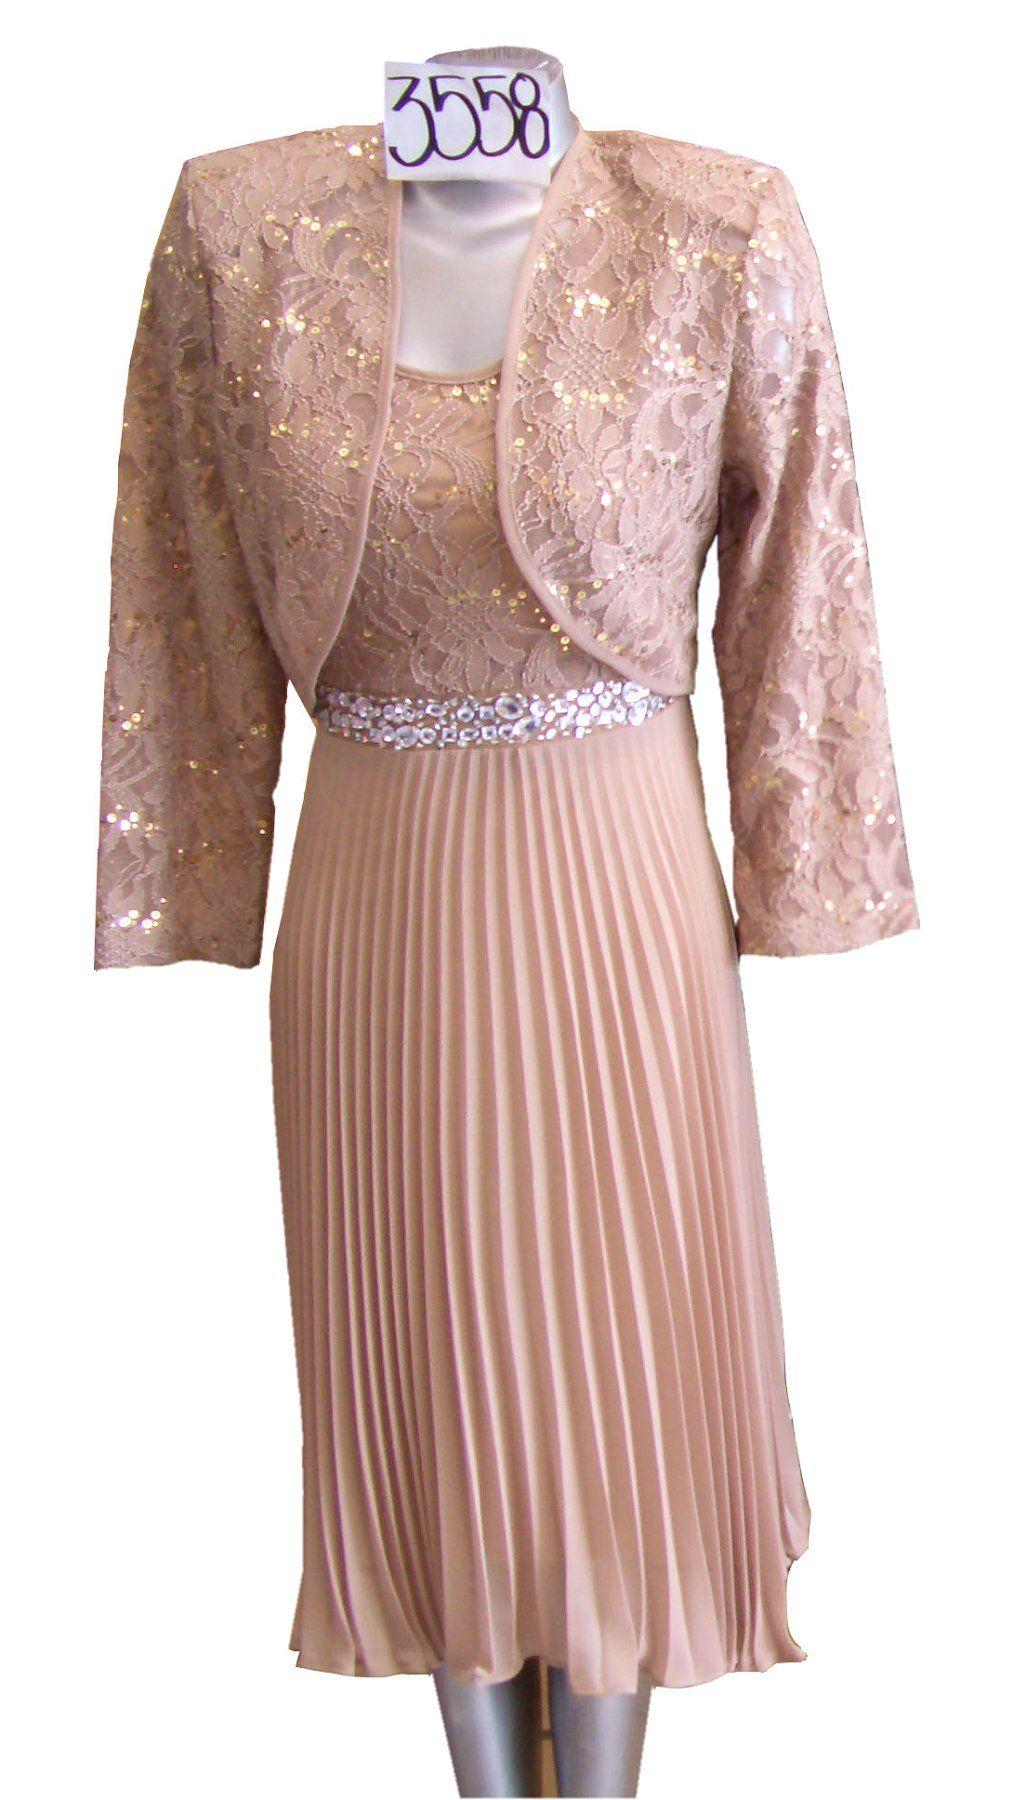 Semi formal wedding guest dresses  Knee Length Khaki Semi Formal Dress Pleated Skirt Lace Jacket